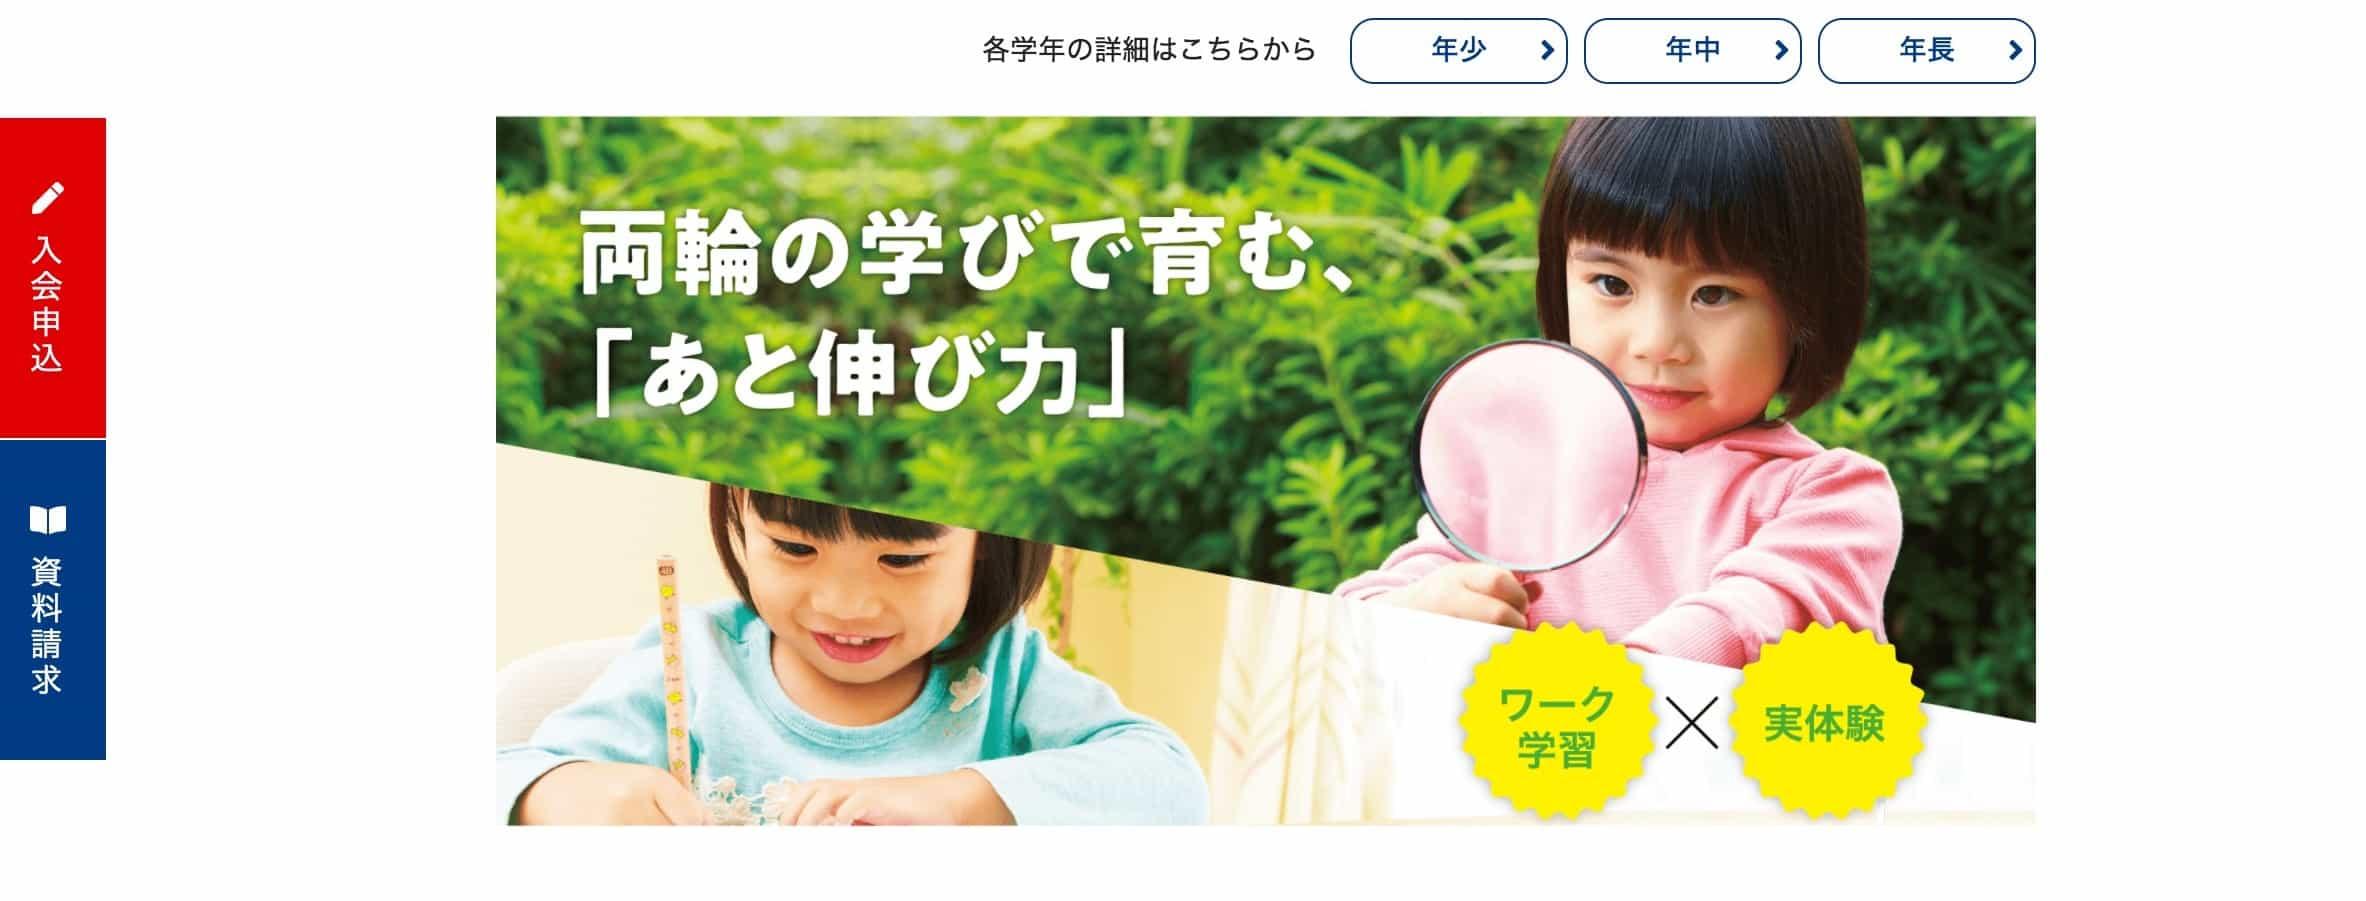 Z会 幼児コース 年少 年中 年長 資料請求 TOP 2020年-min